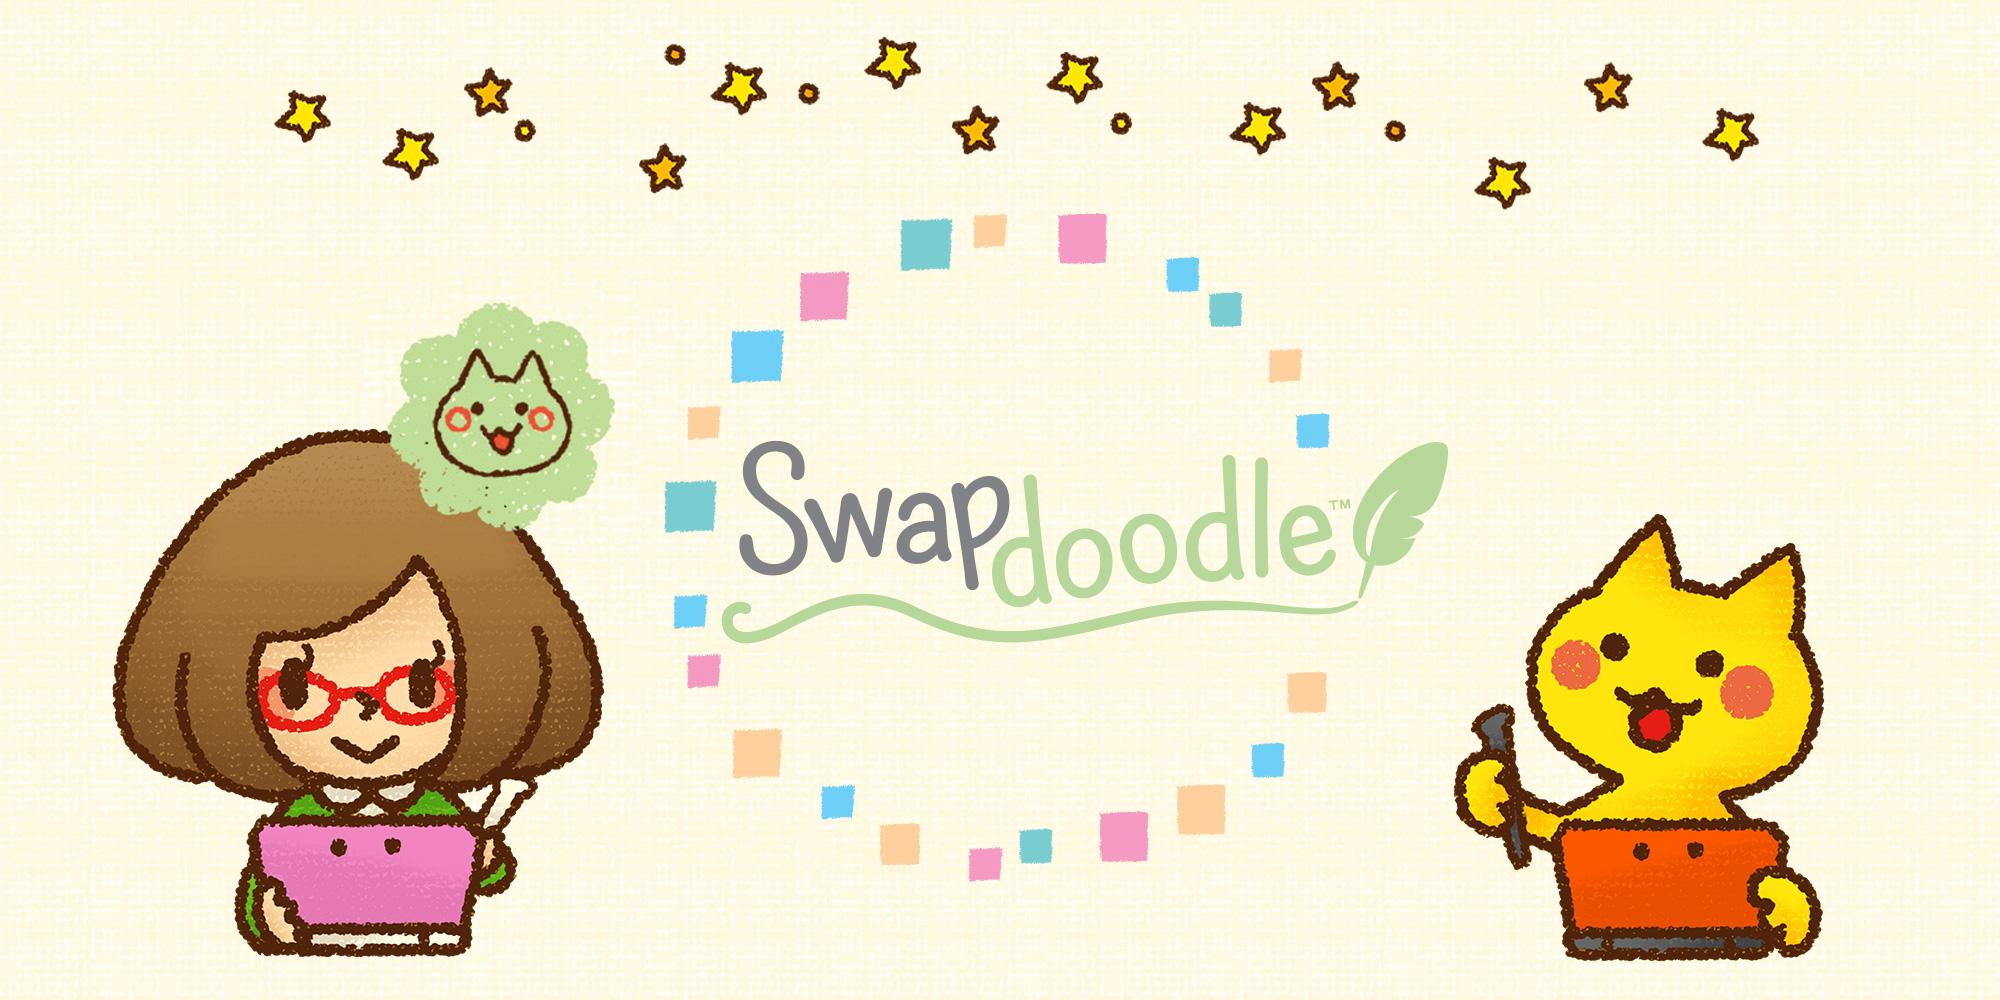 Nintendo: Swapdoodle H2x1_3DSDS_Swapdoodle